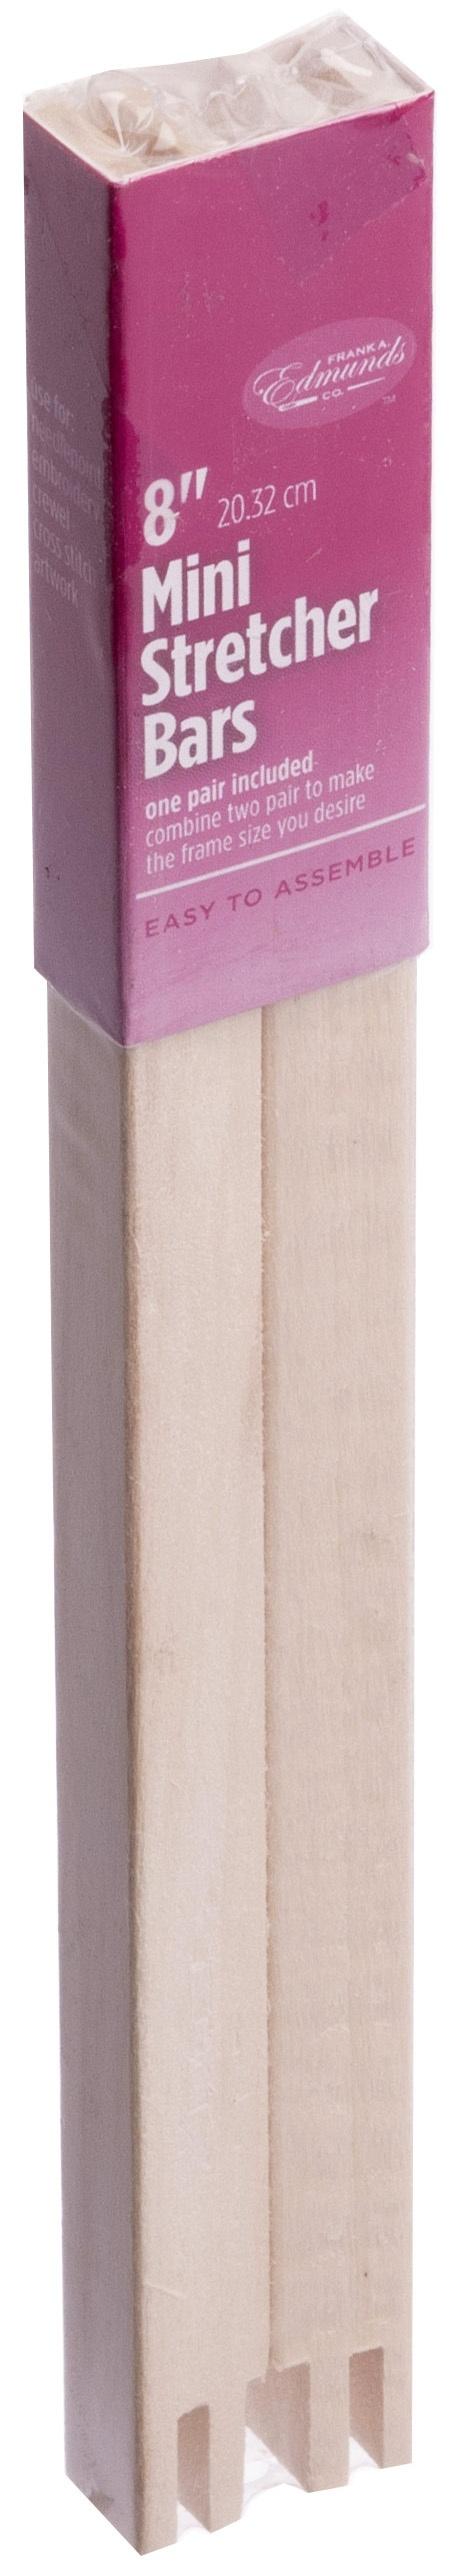 "Frank A 2008 Edmunds Mini Stretcher Bars-8/""X.5/"""